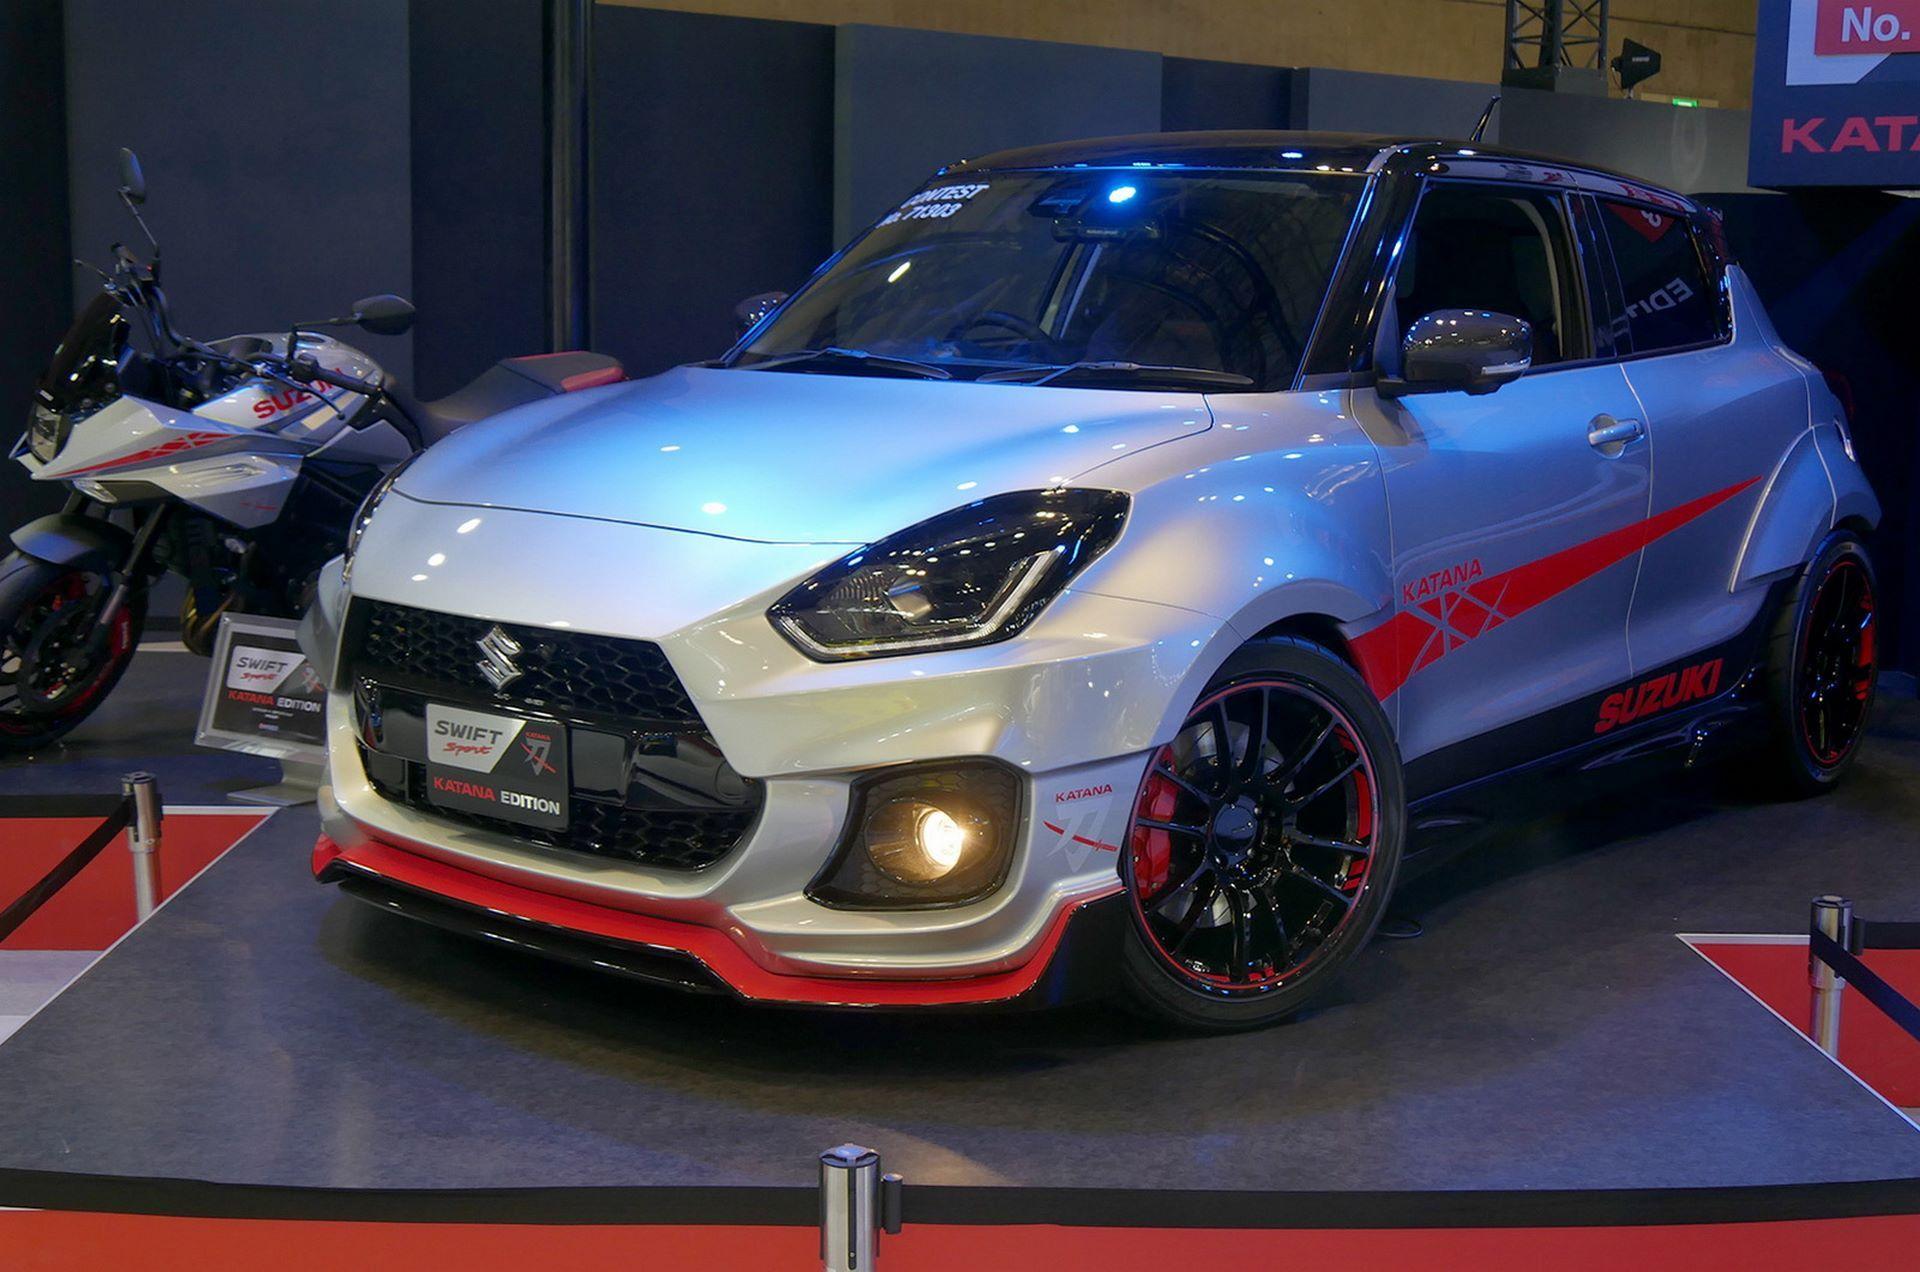 Suzuki-Swift-Sport-Katana-17